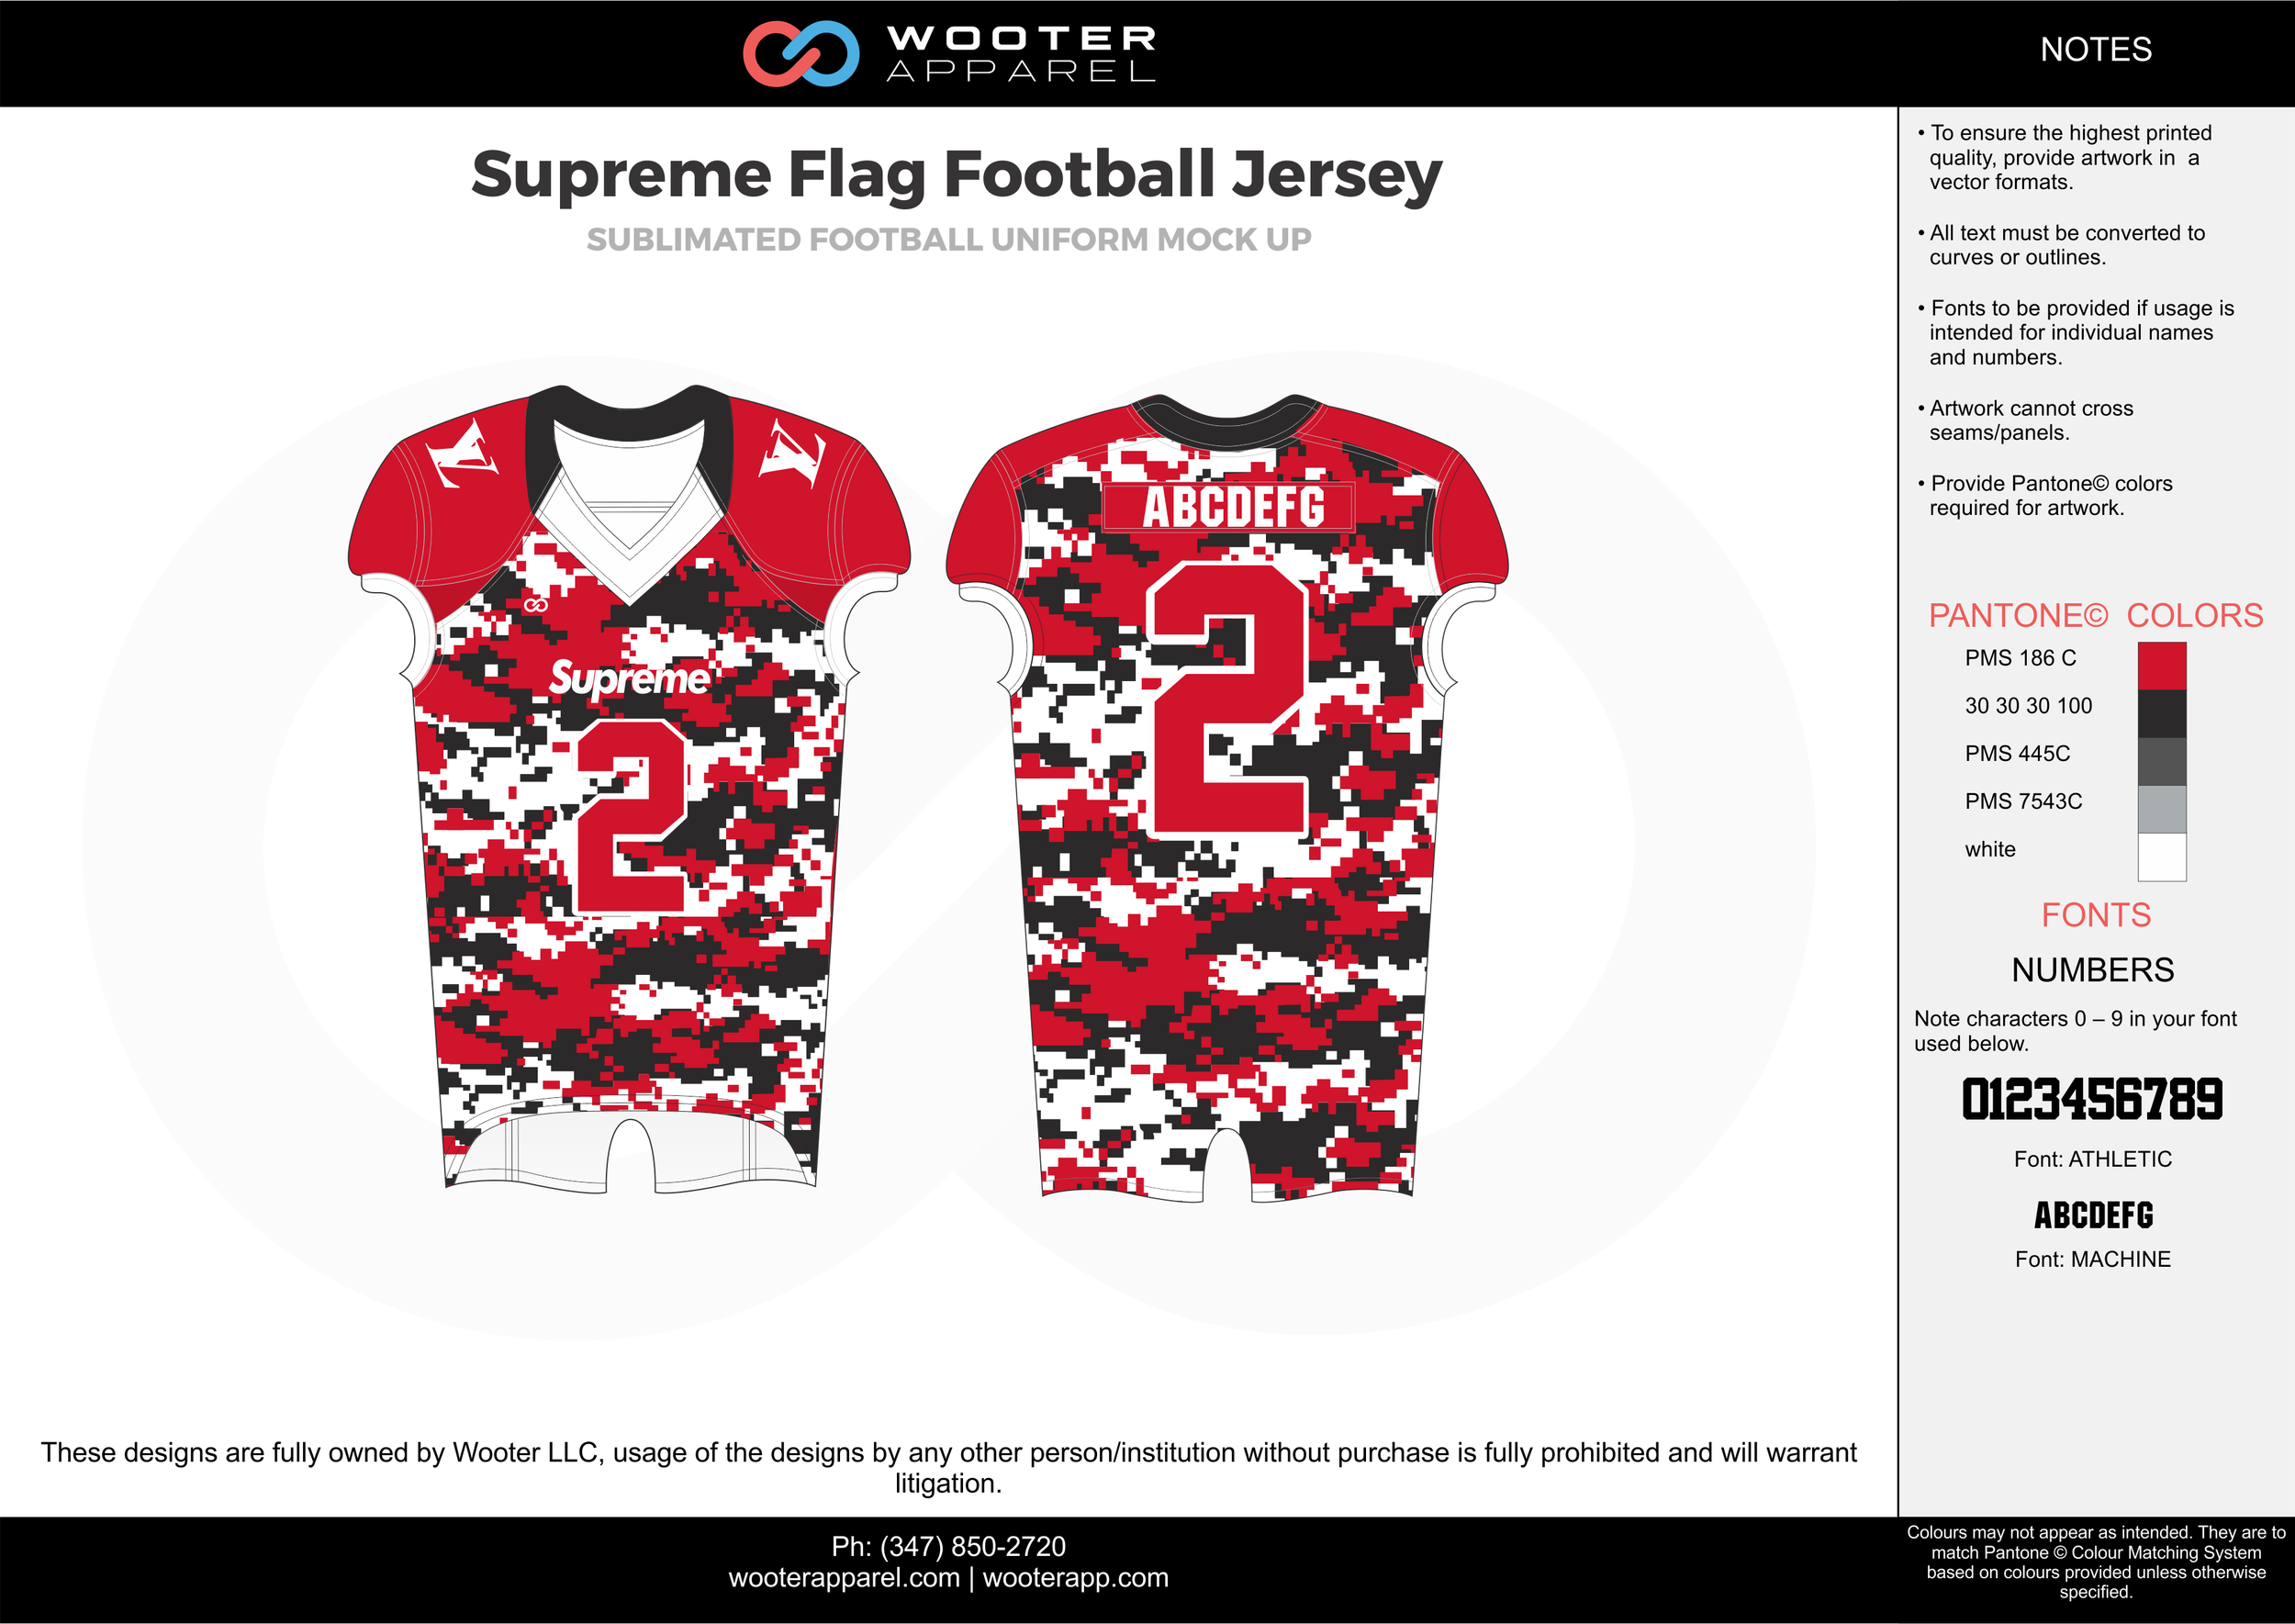 Supreme Flag red grey black white football uniforms jerseys top